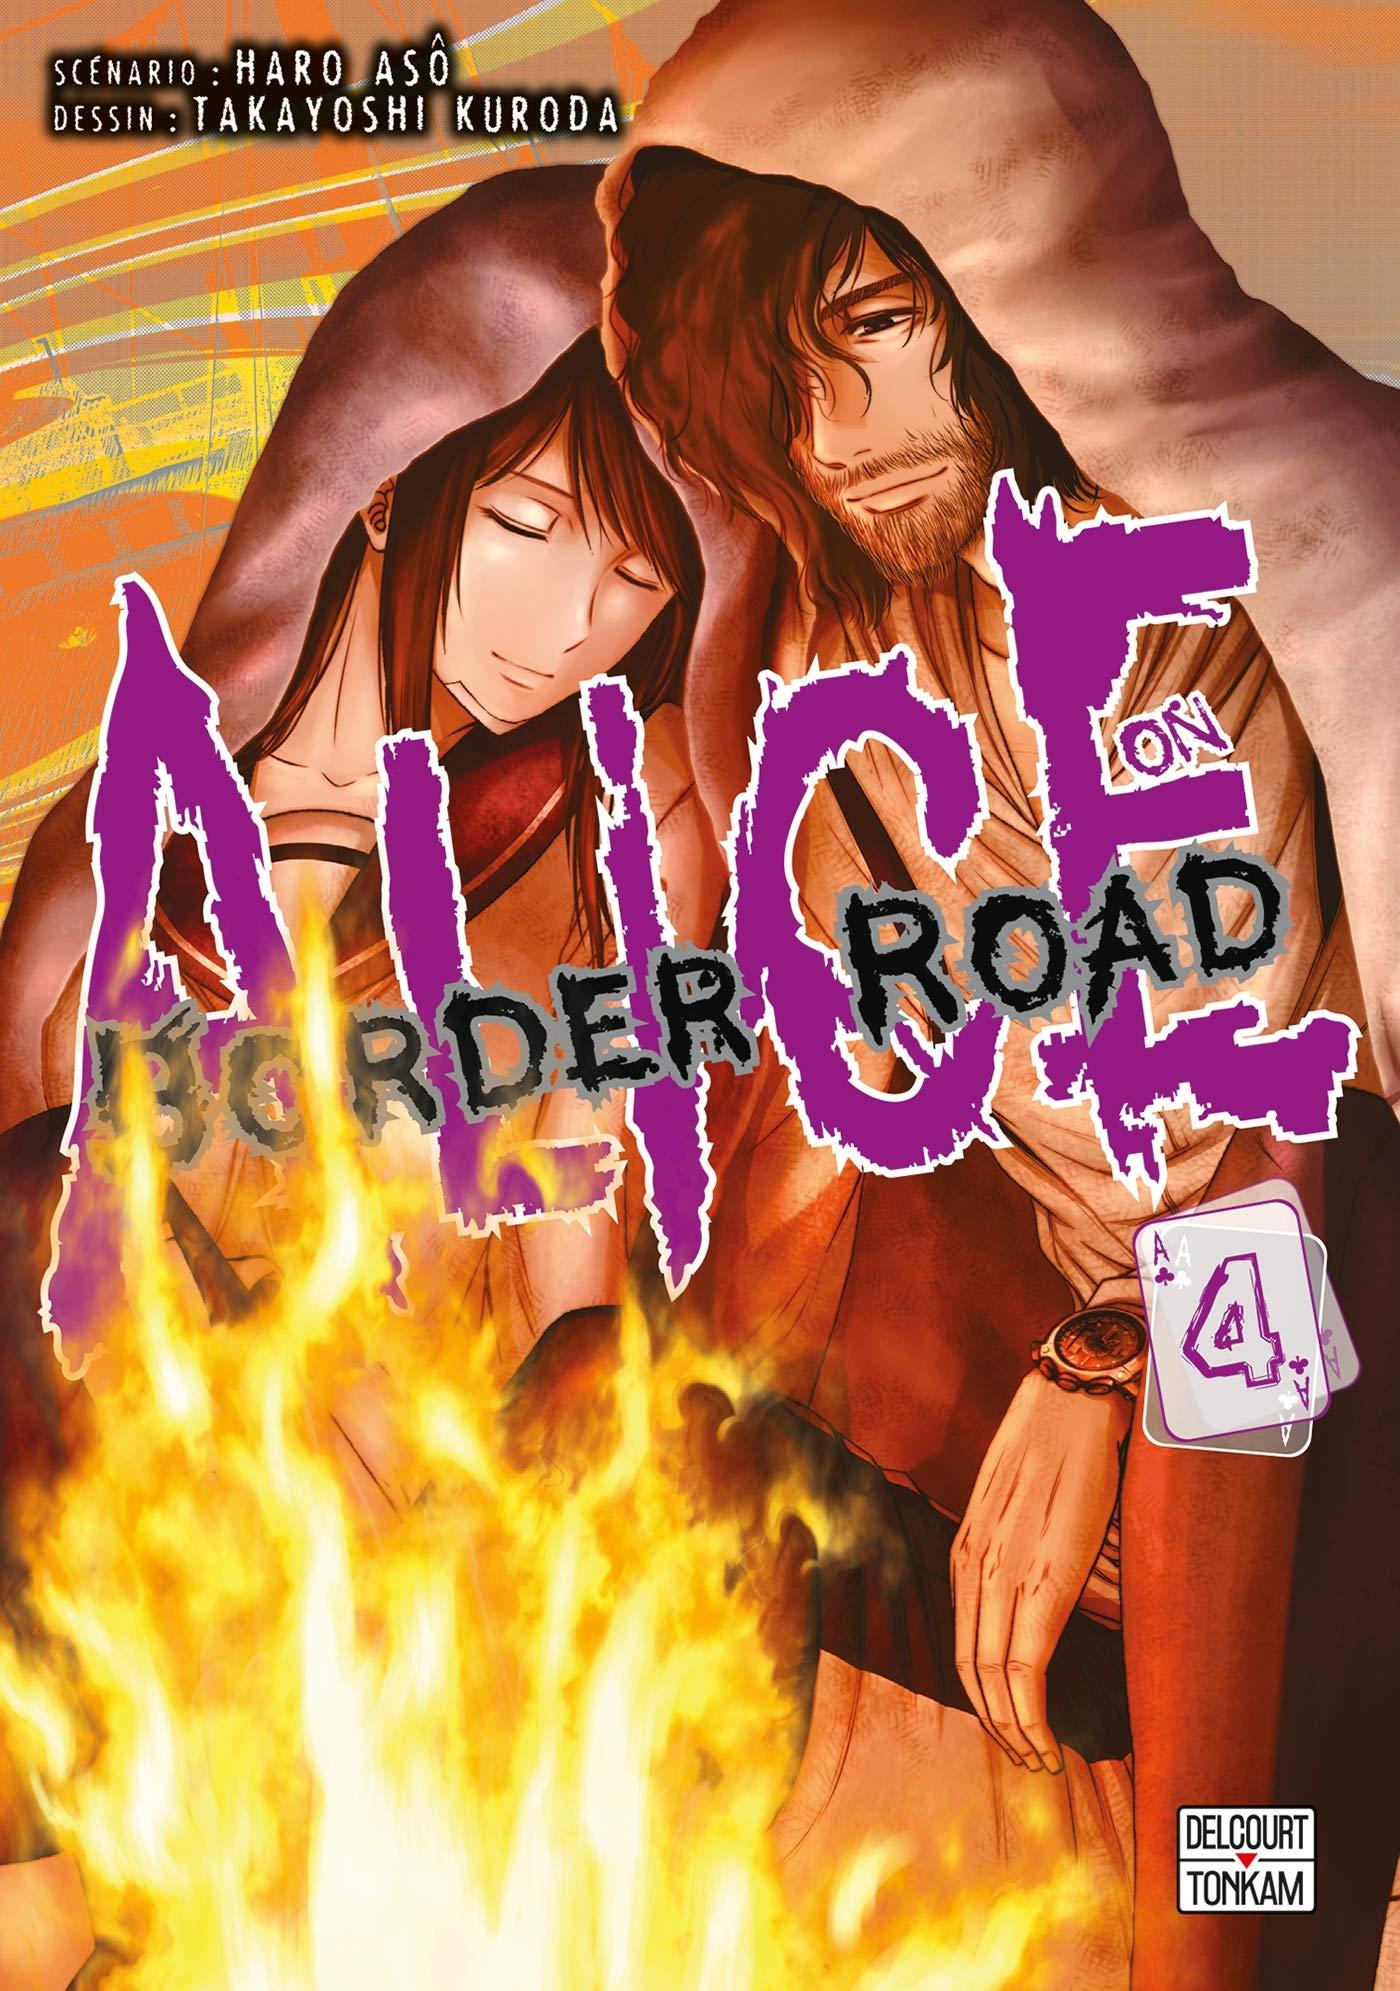 Alice on Border road 4